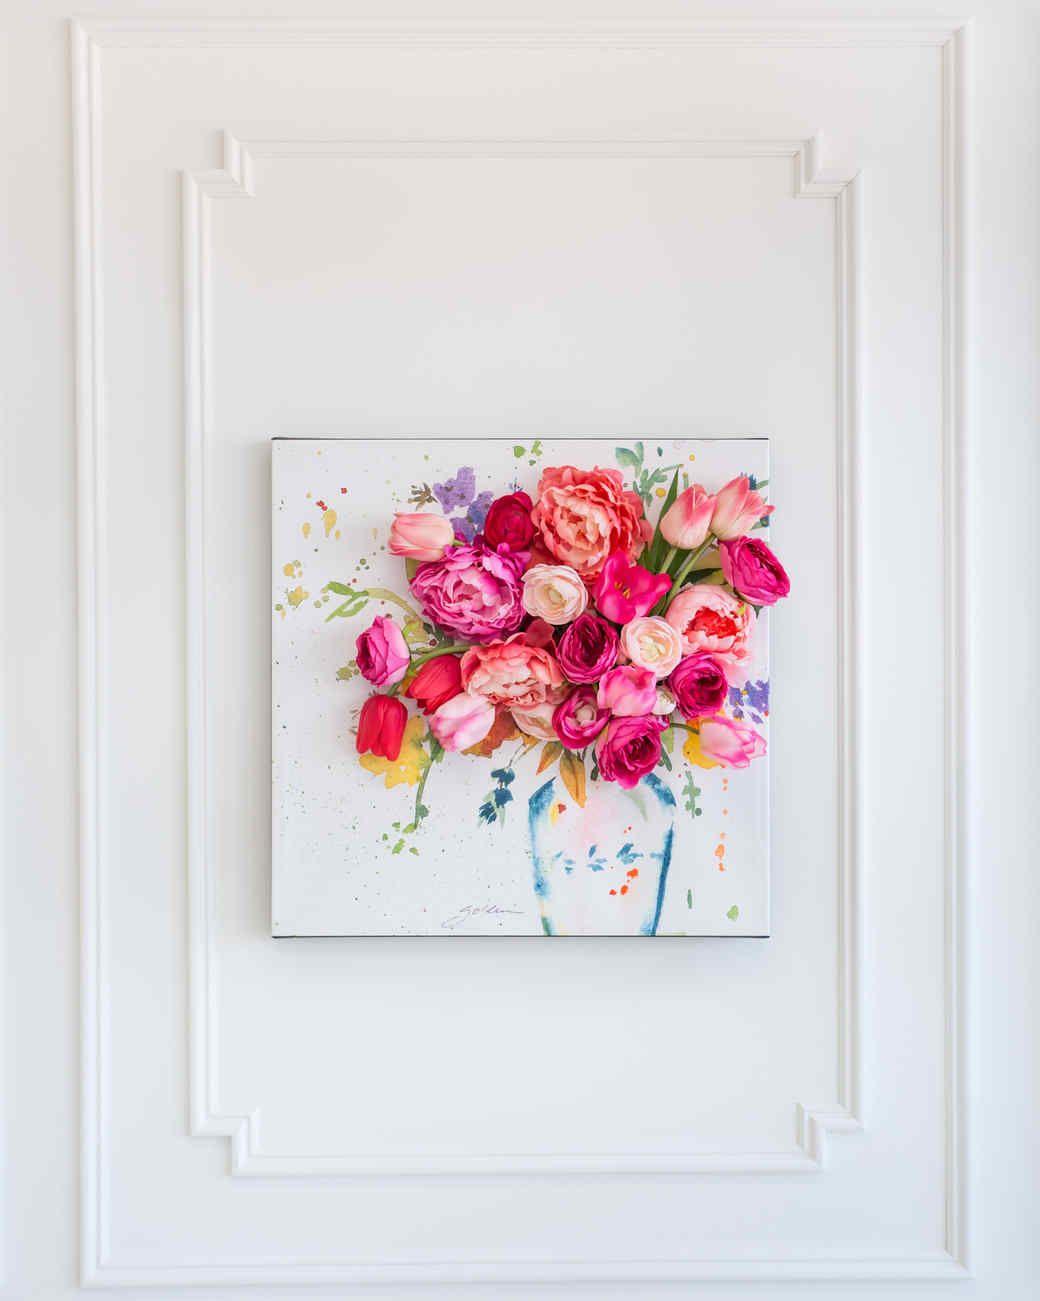 3 D Floral Canvas Wall Art Crafts Floral Wall Art Diy Wall Art